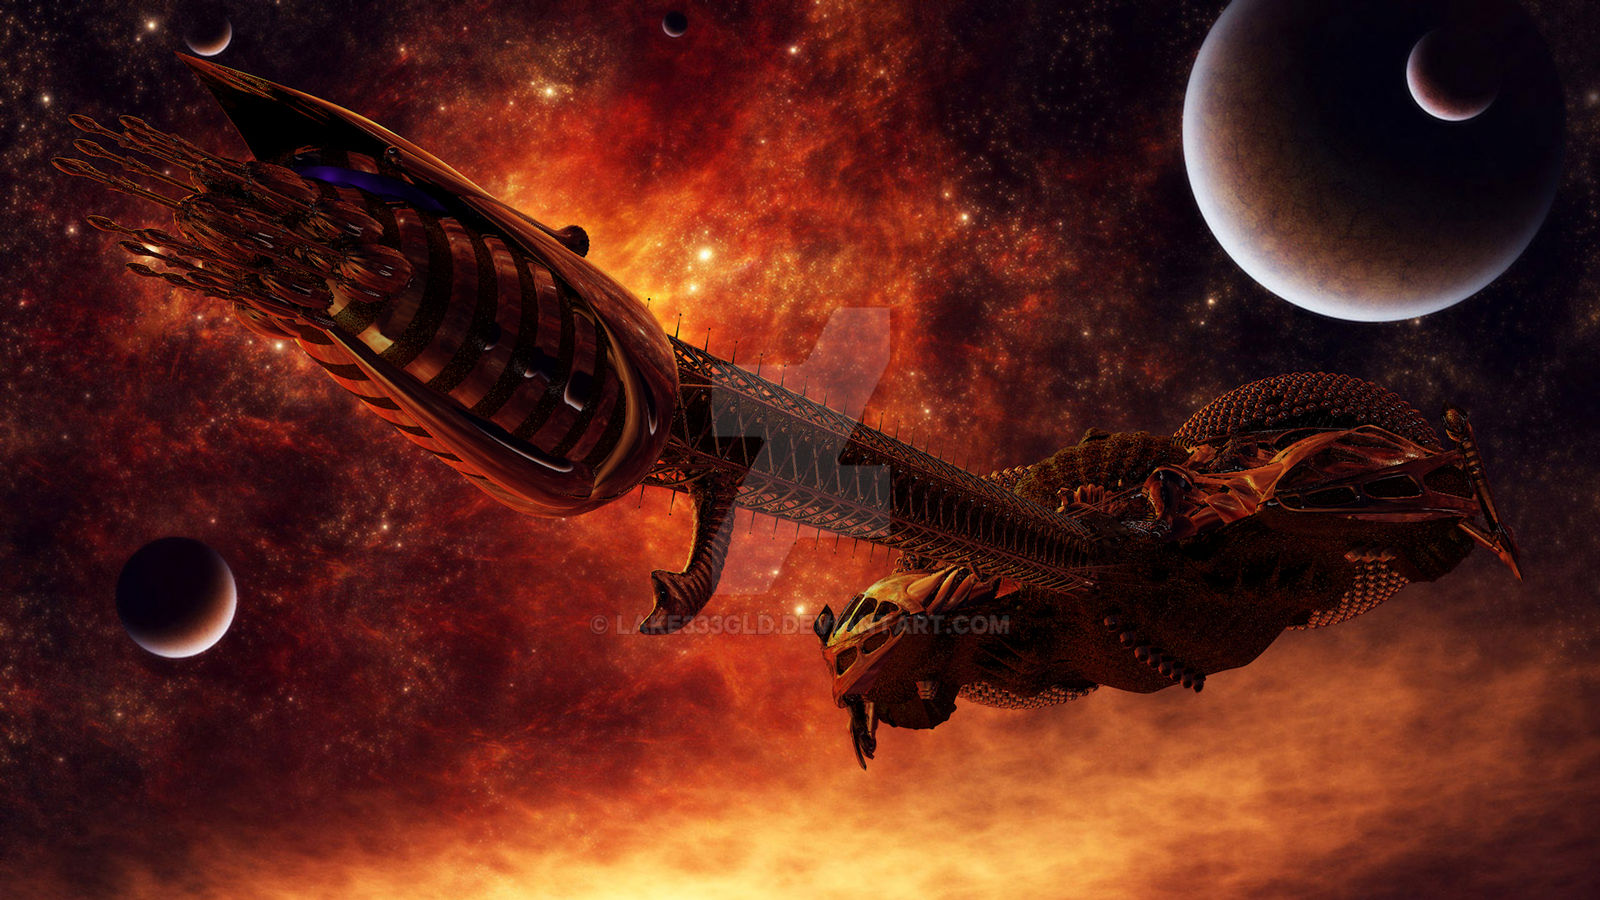 LEXX: The Inferno is under control